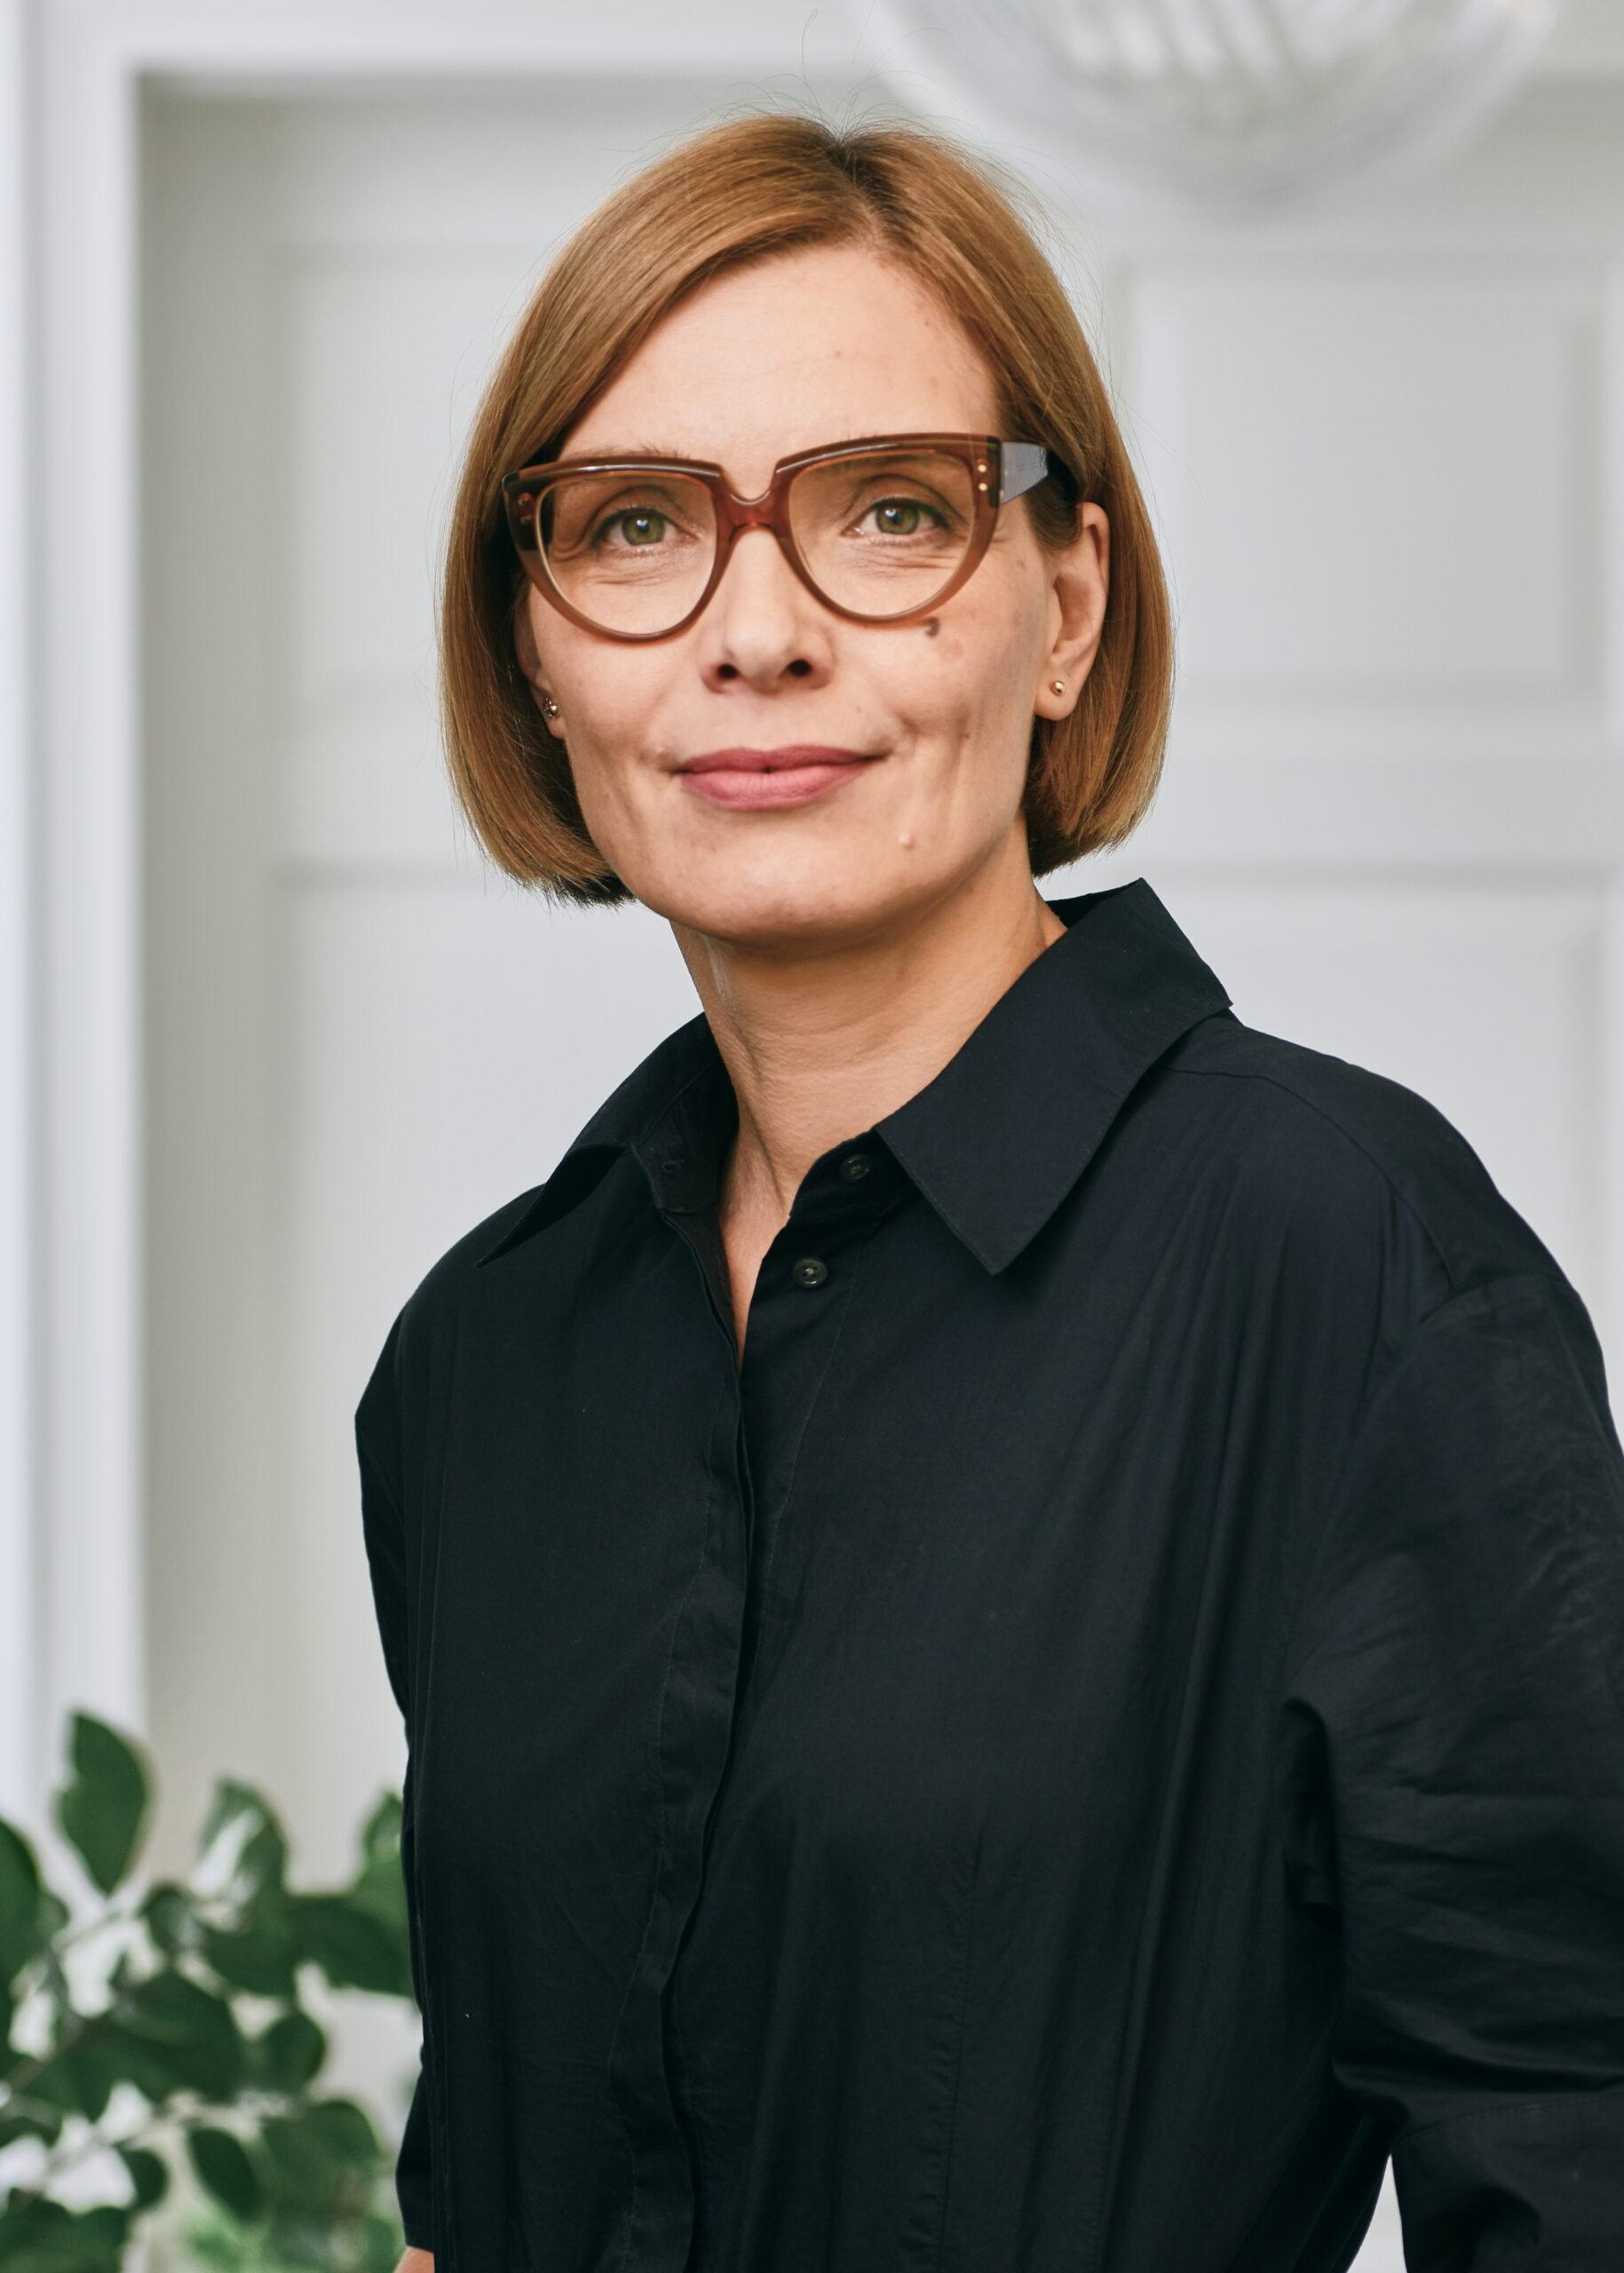 Olga Markiewicz